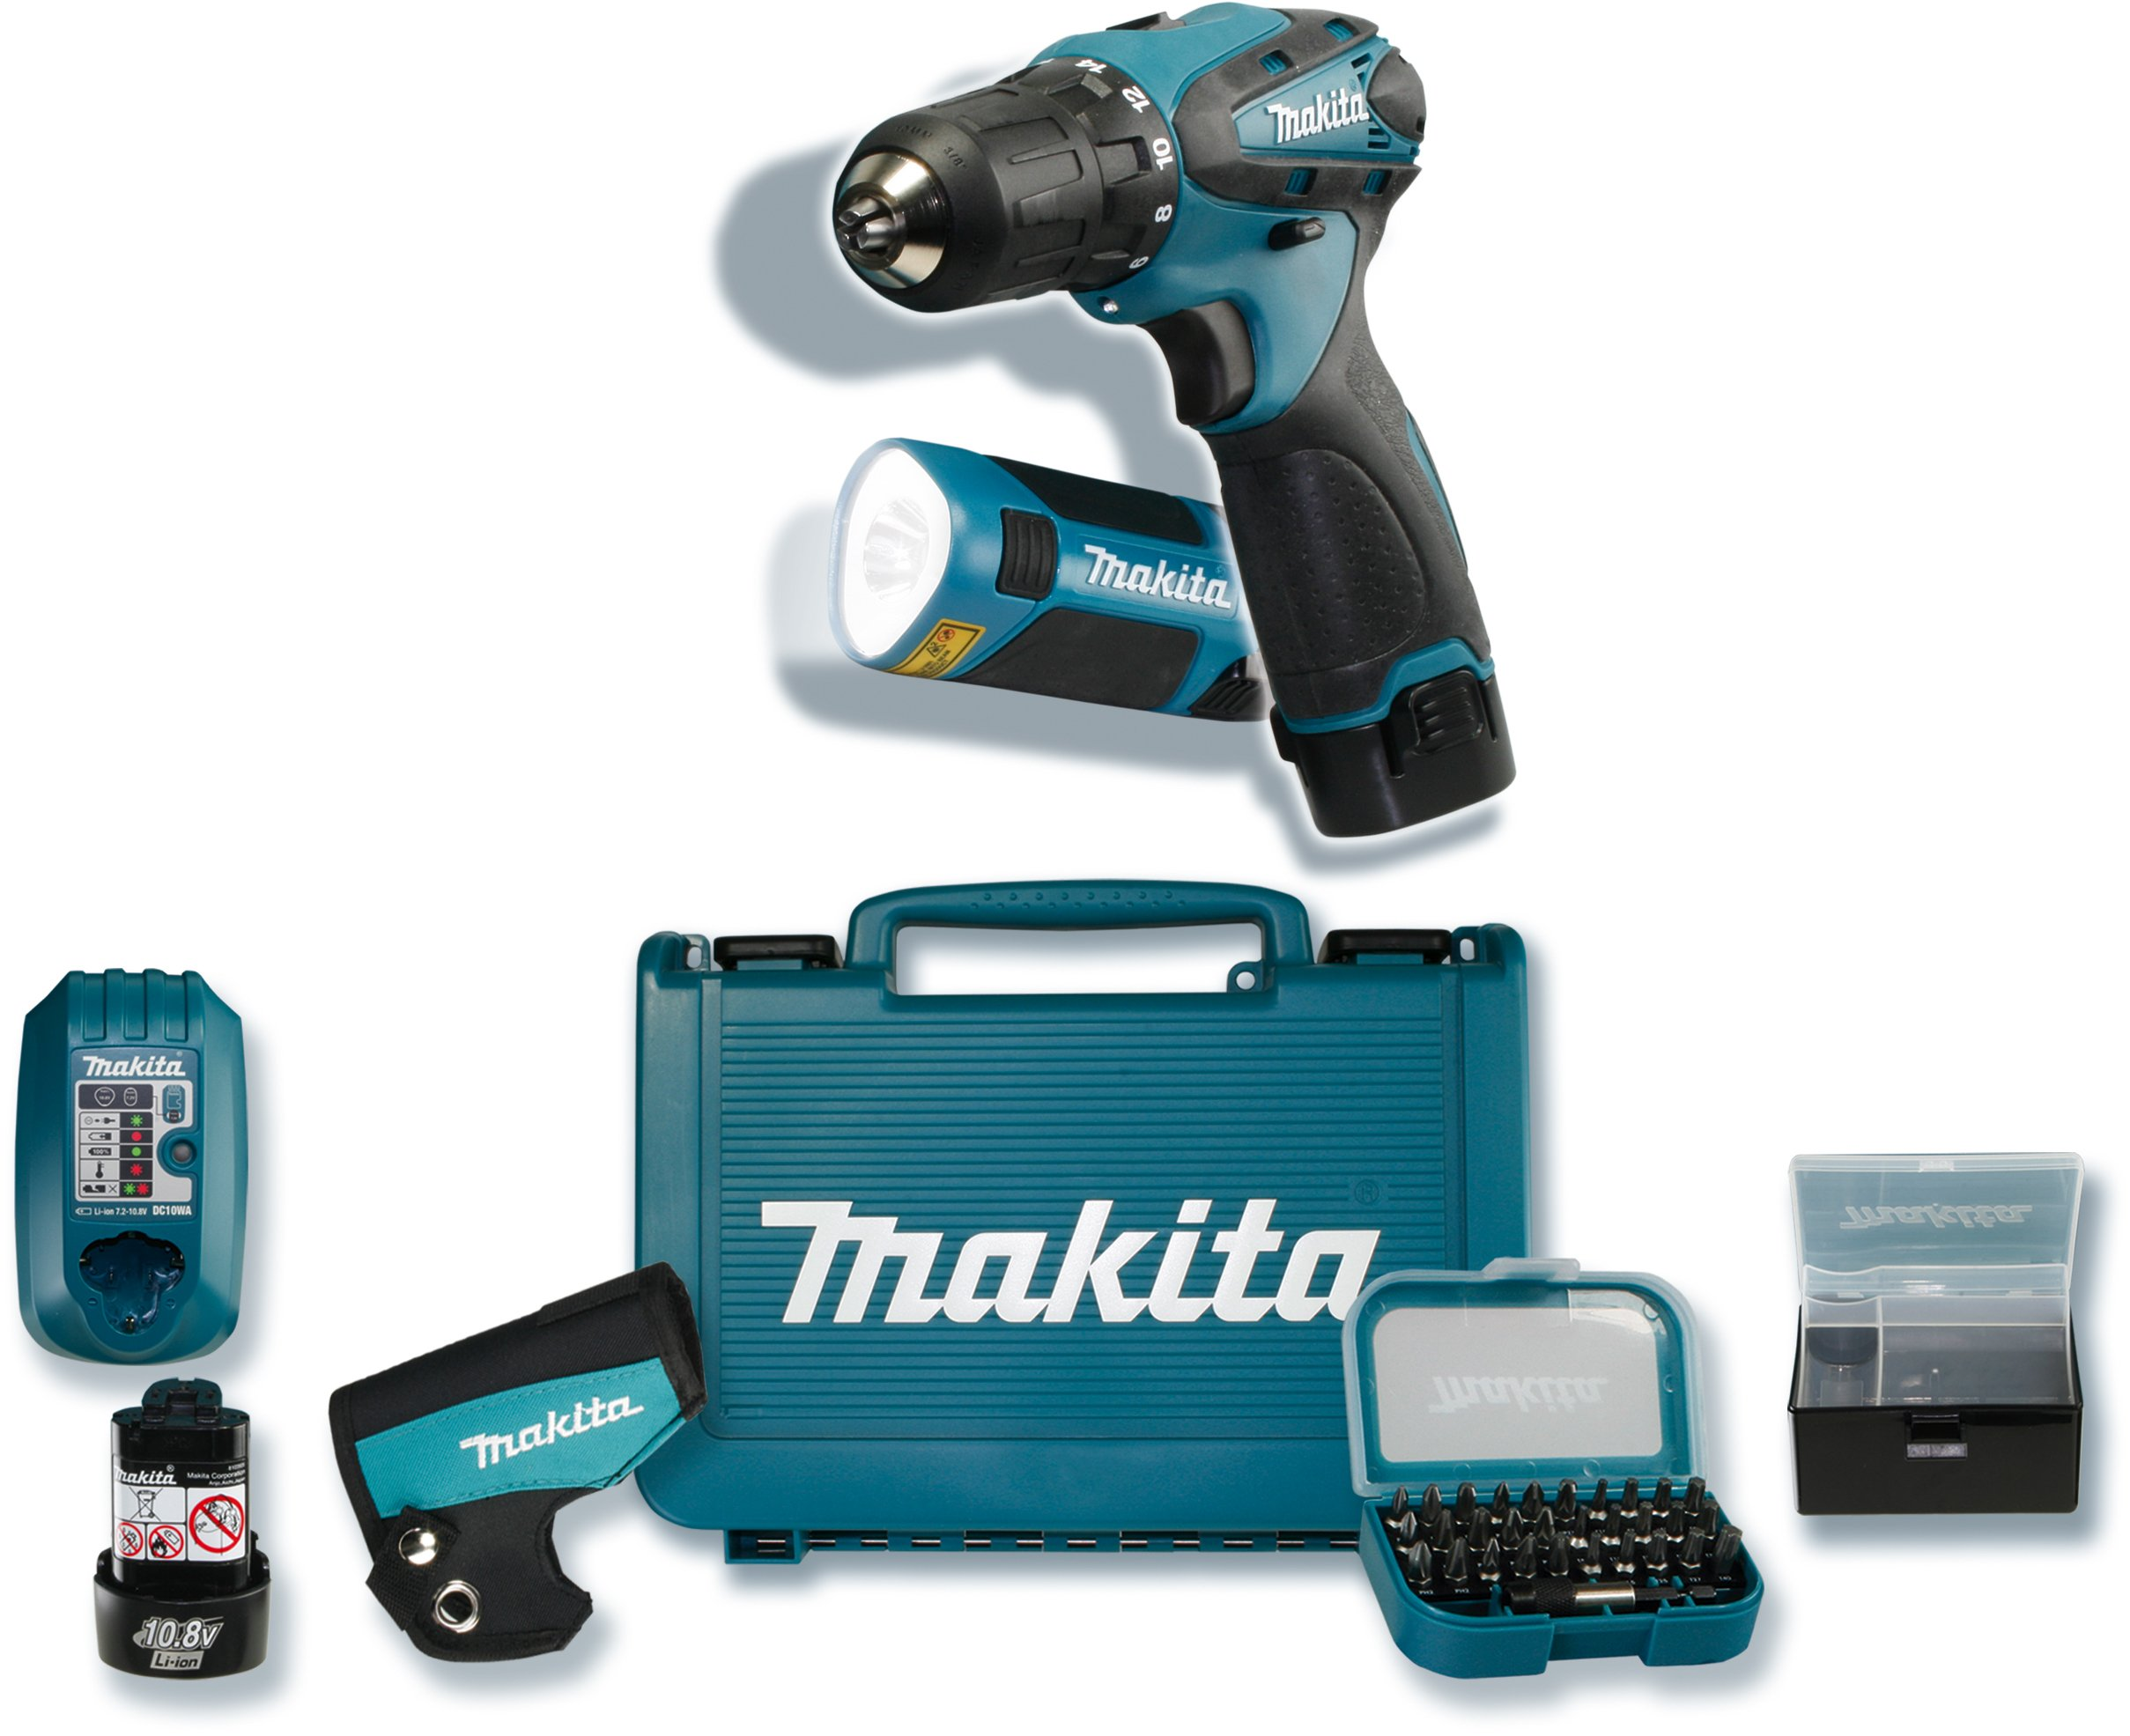 Makita-DF330DWLX-Akku-Bohrschrauber-108-V-Akku-Lampe-2-Akkus-und-Ladegert